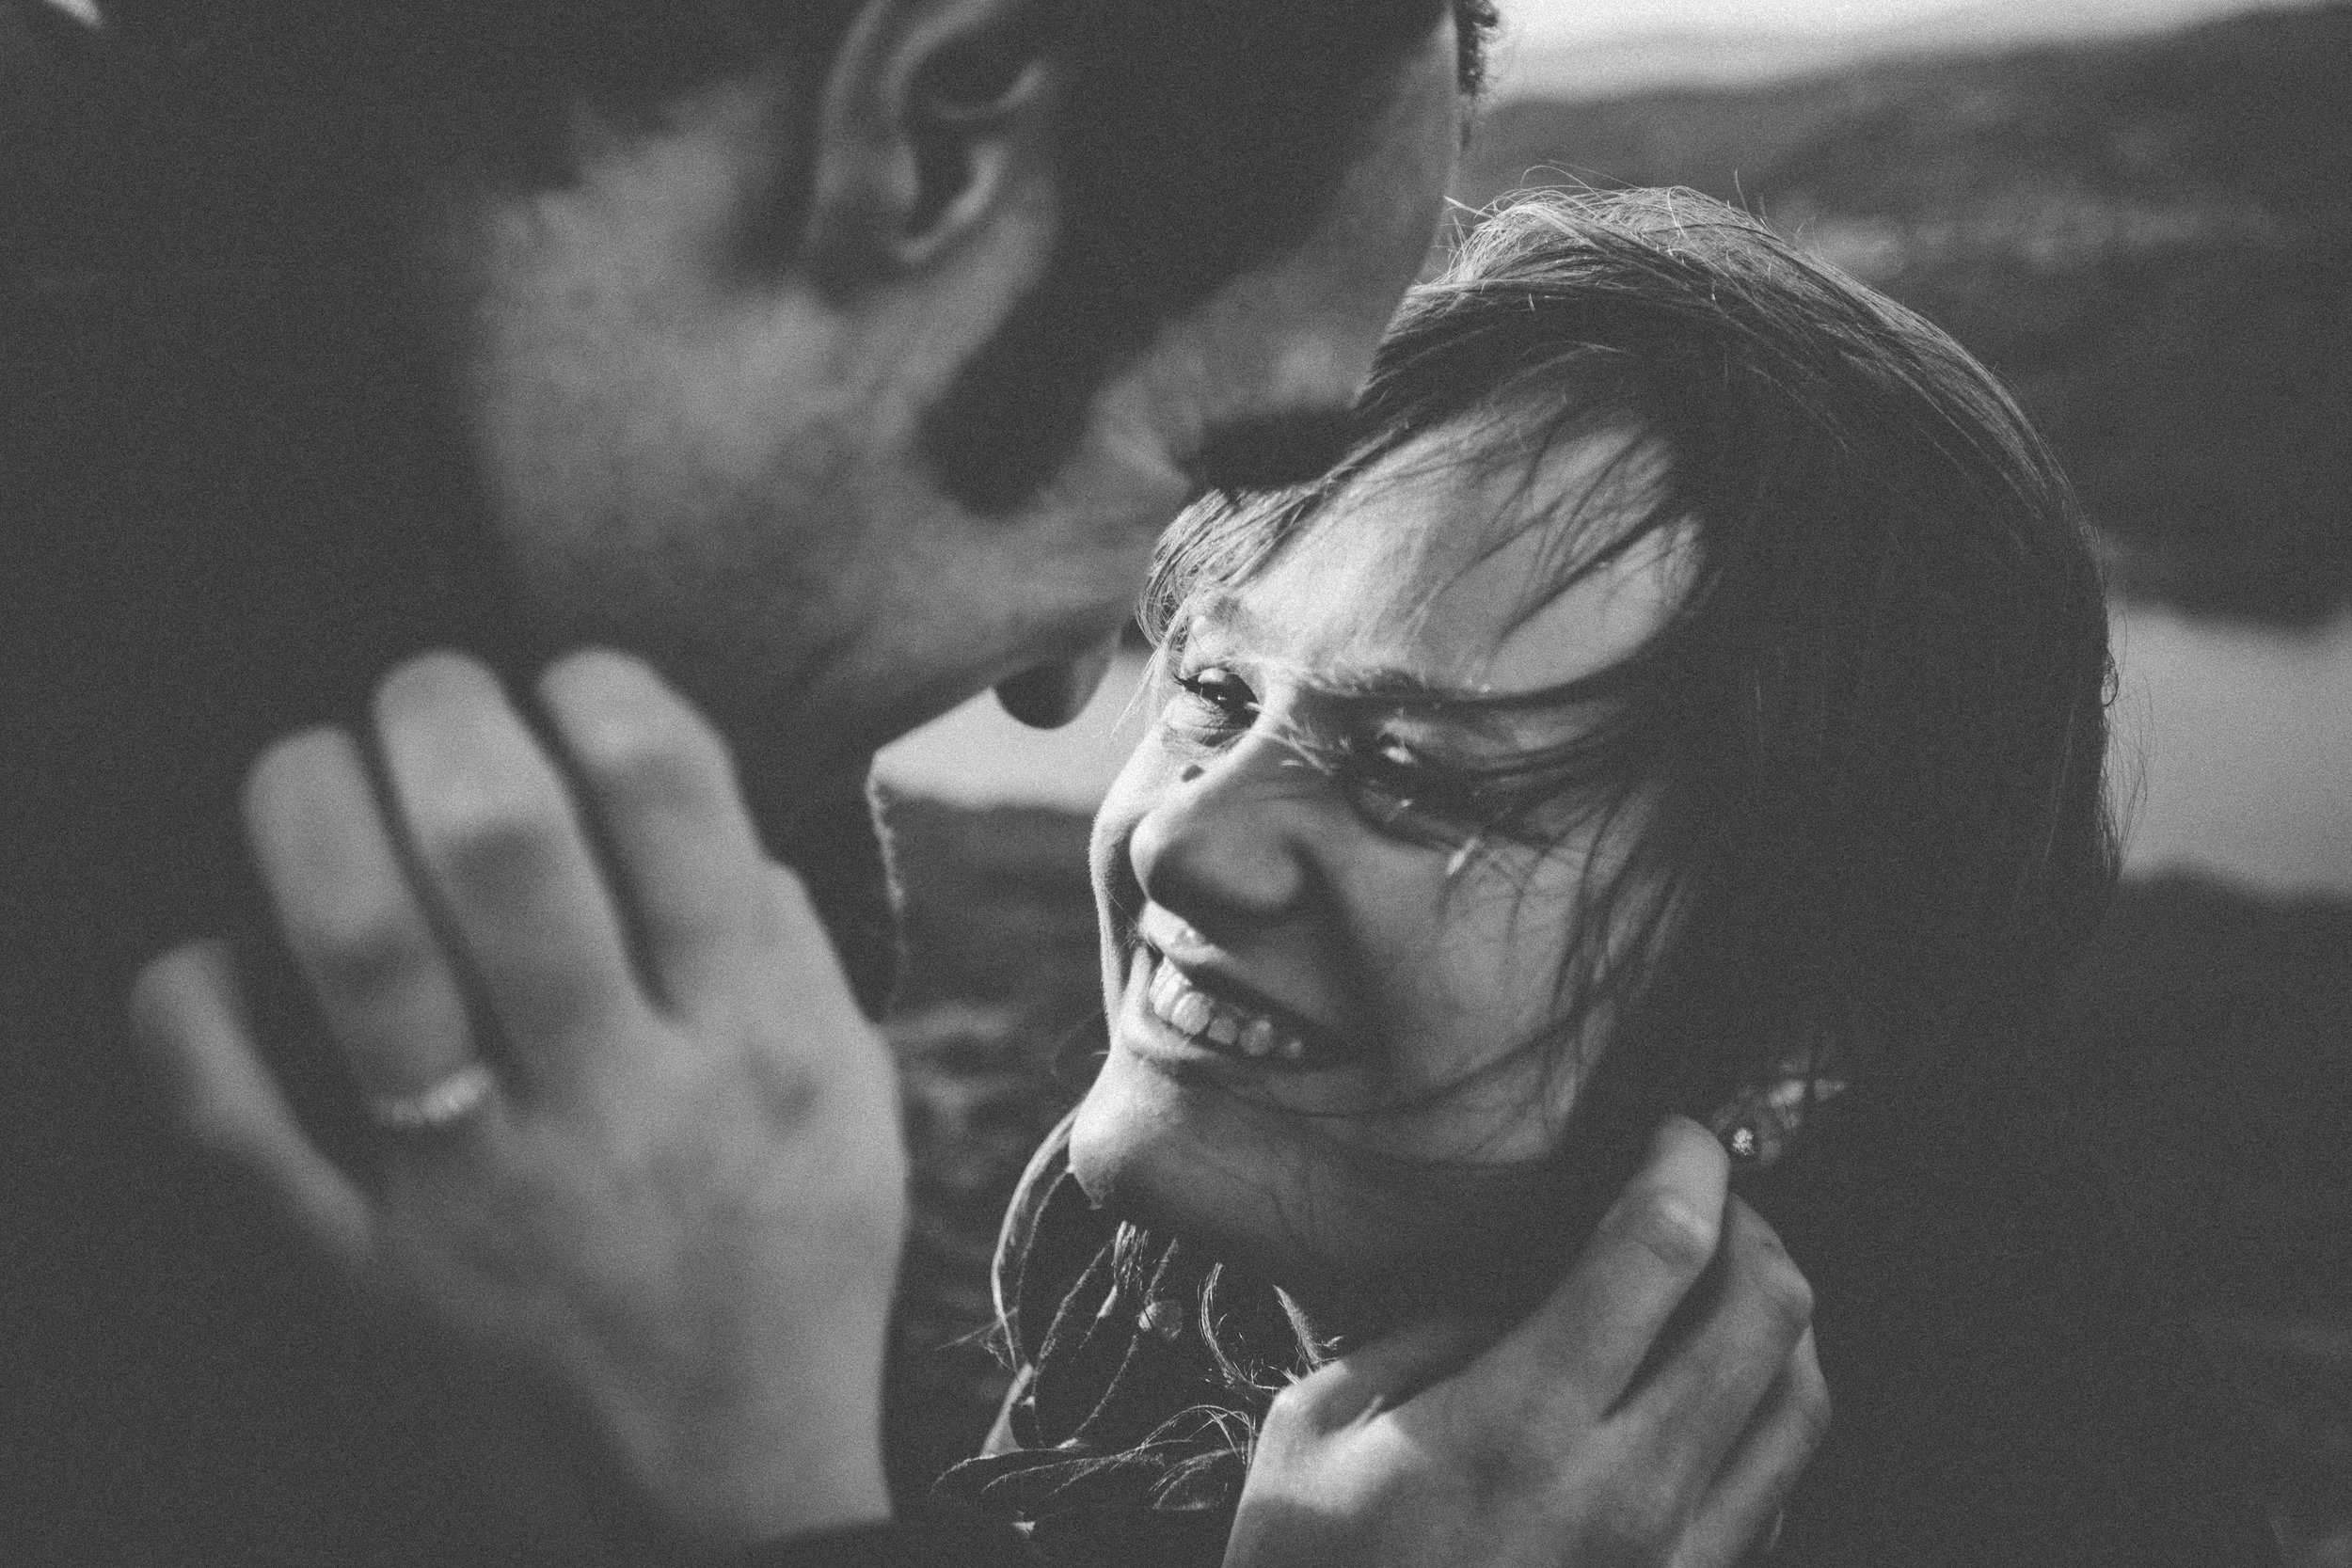 Alex + Matt - Windermere Engagement Photography - Claire Basiuk - 38.jpg